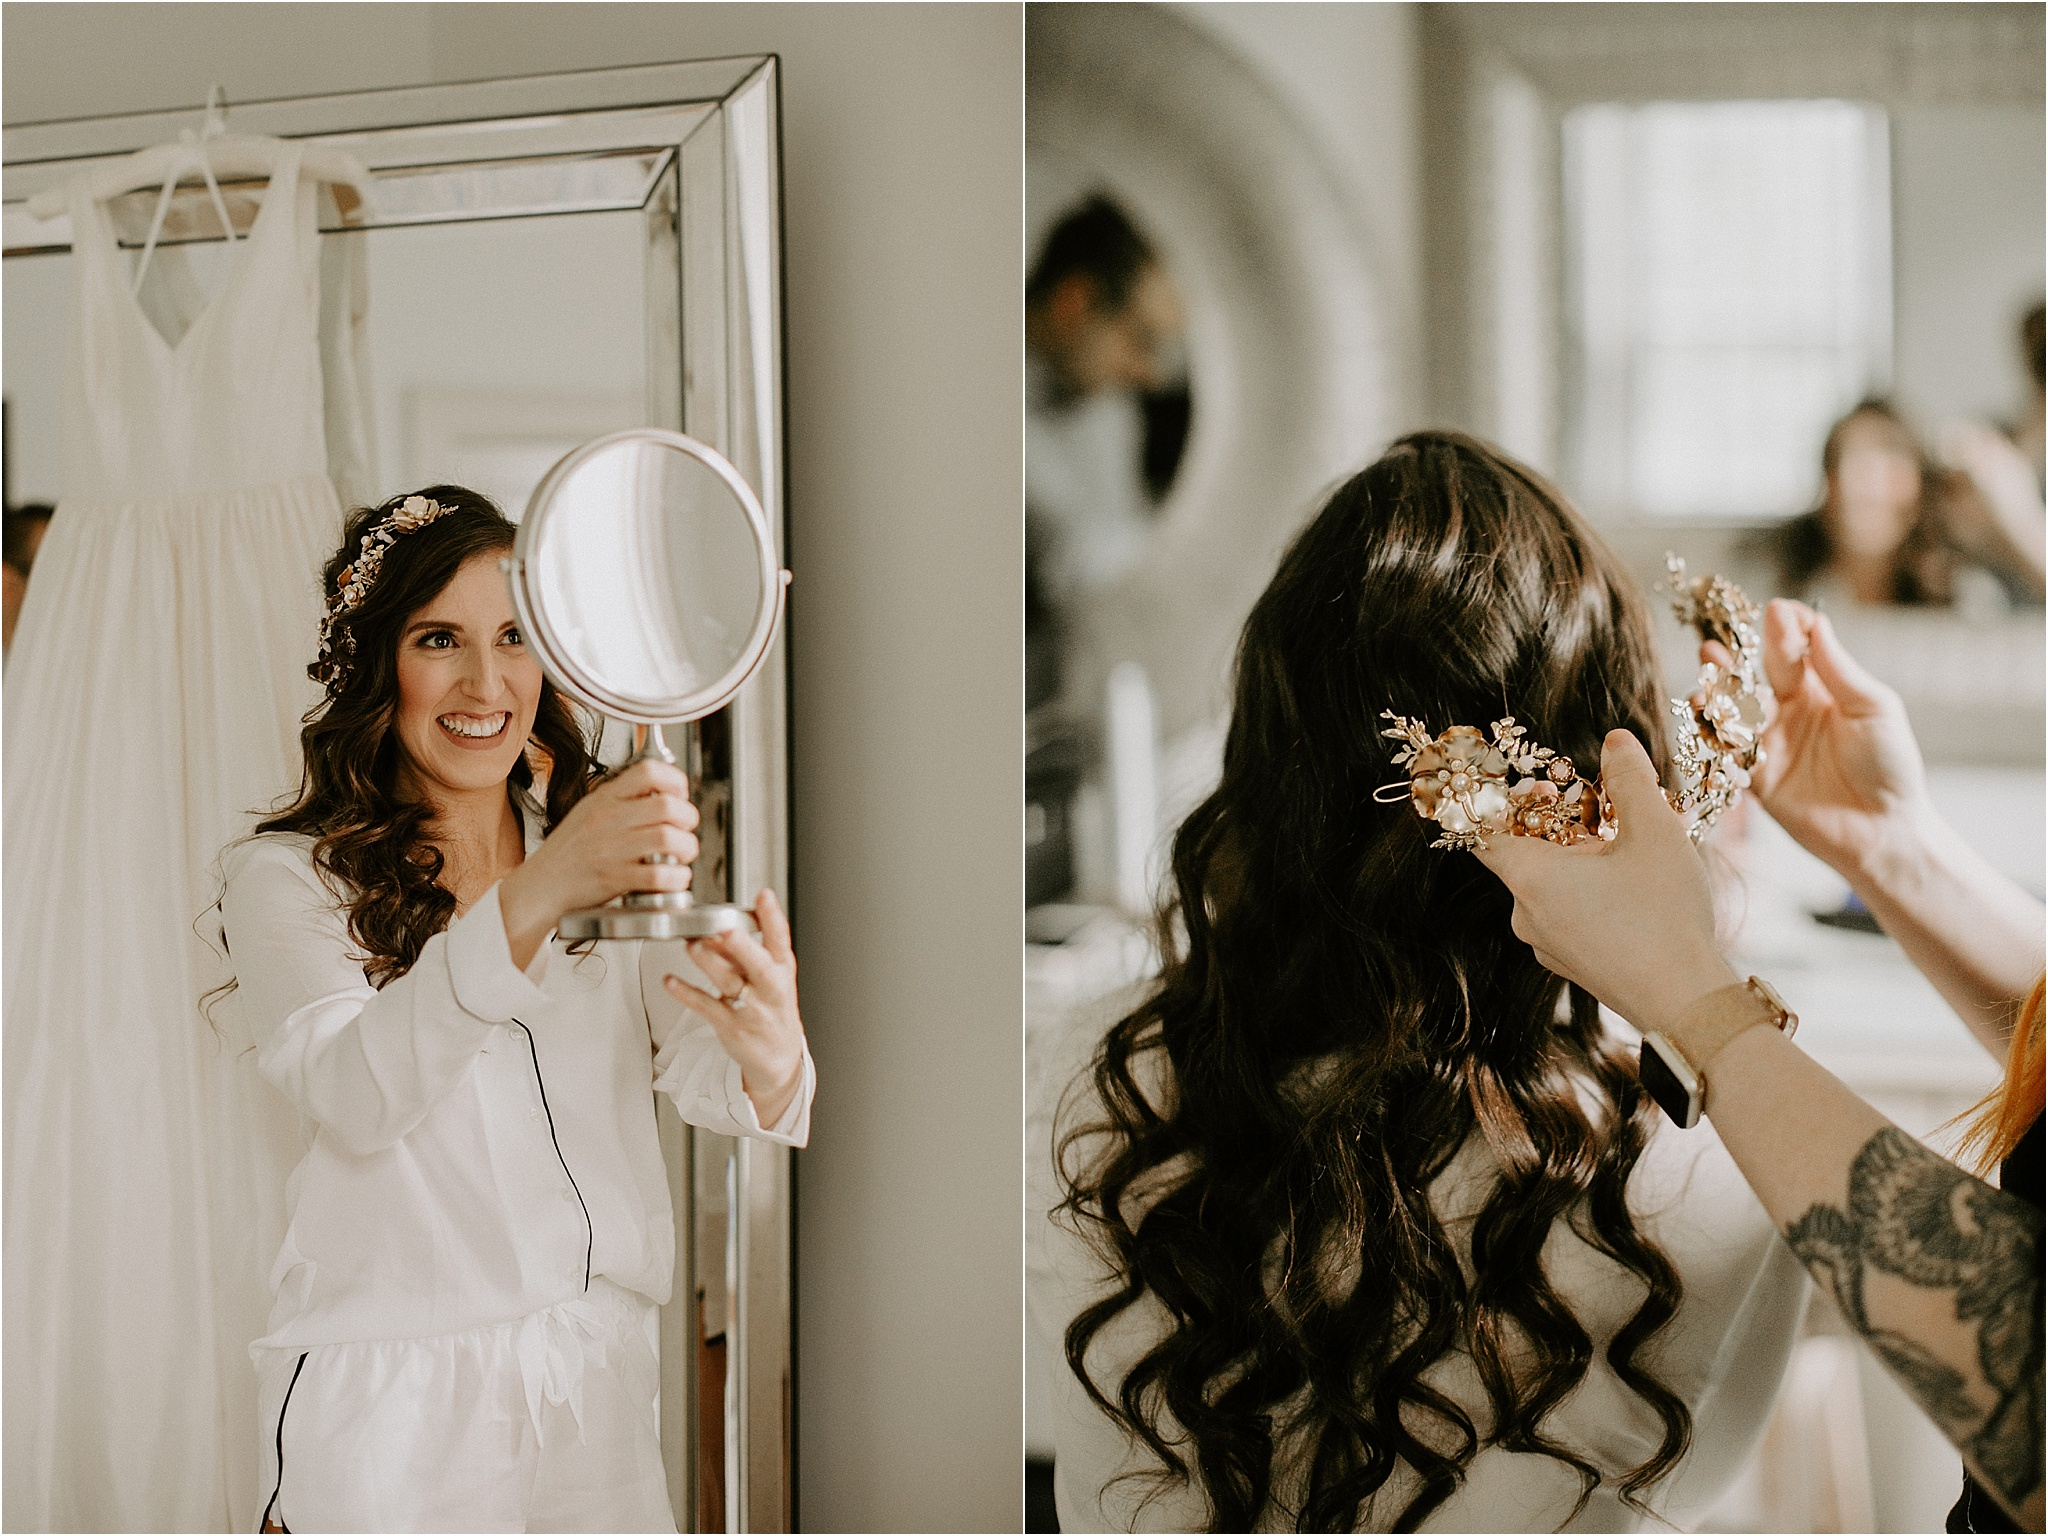 Sarah_Brookhart_Farm_at_Eagles_Ridge_Wedding_Photographer_0006.jpg